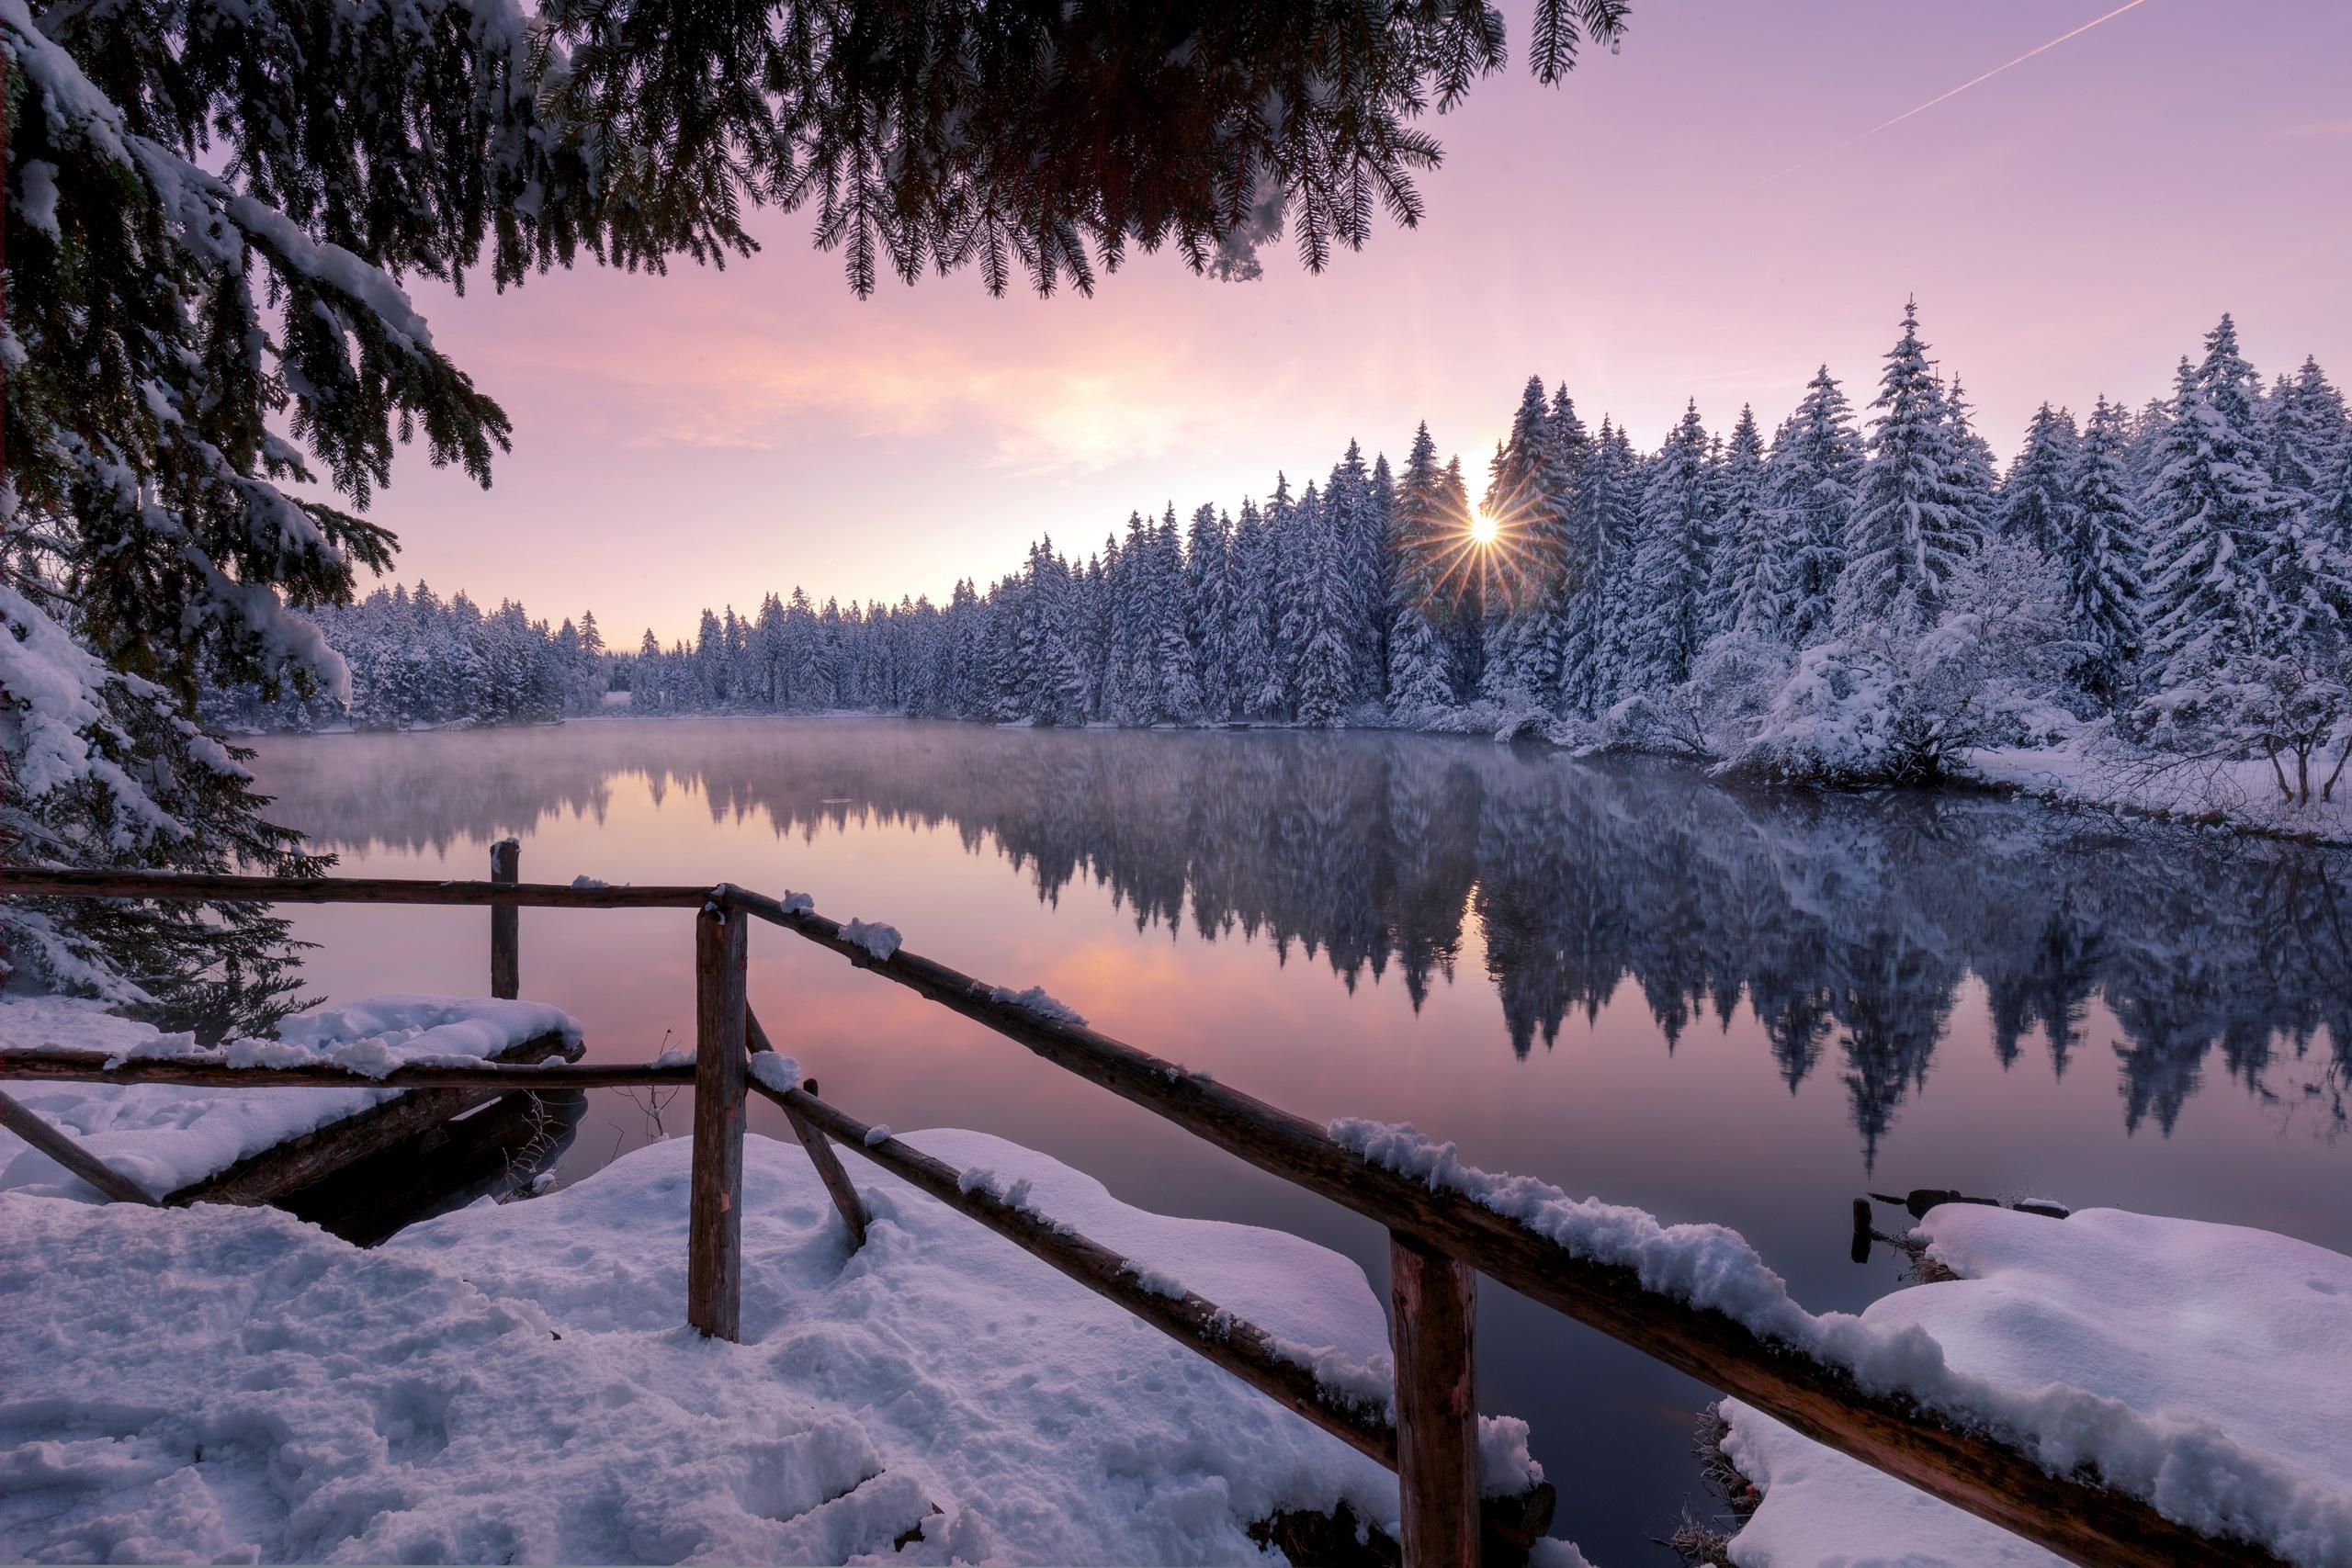 winter snow trees nature outdoors 1574939588 - Winter Snow Trees Nature Outdoors -